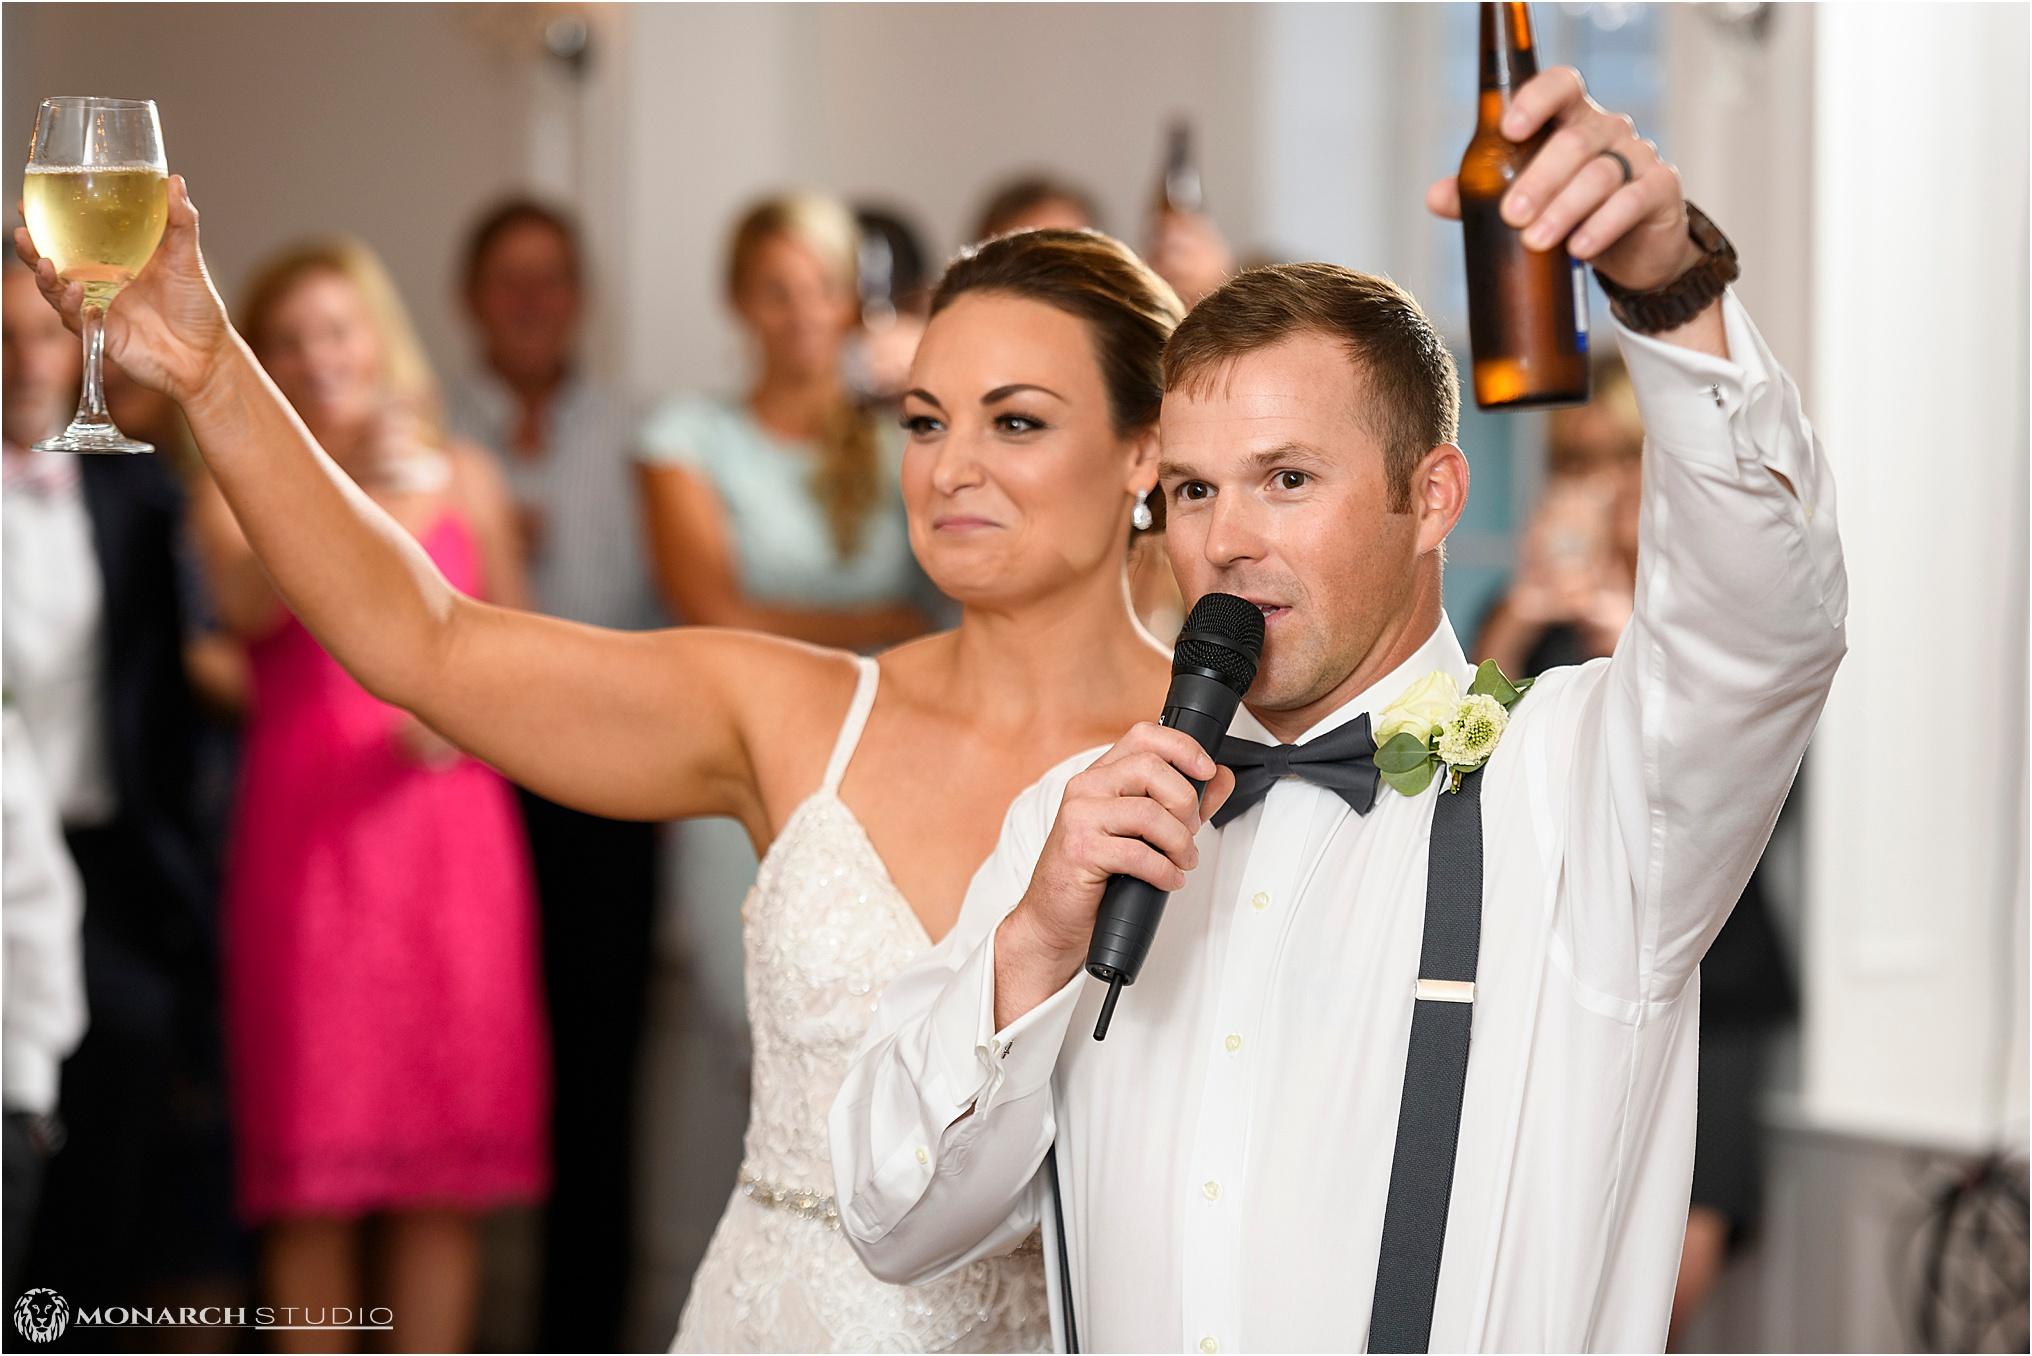 095-whiteroom-wedding-photographer-2019-05-22_0077.jpg